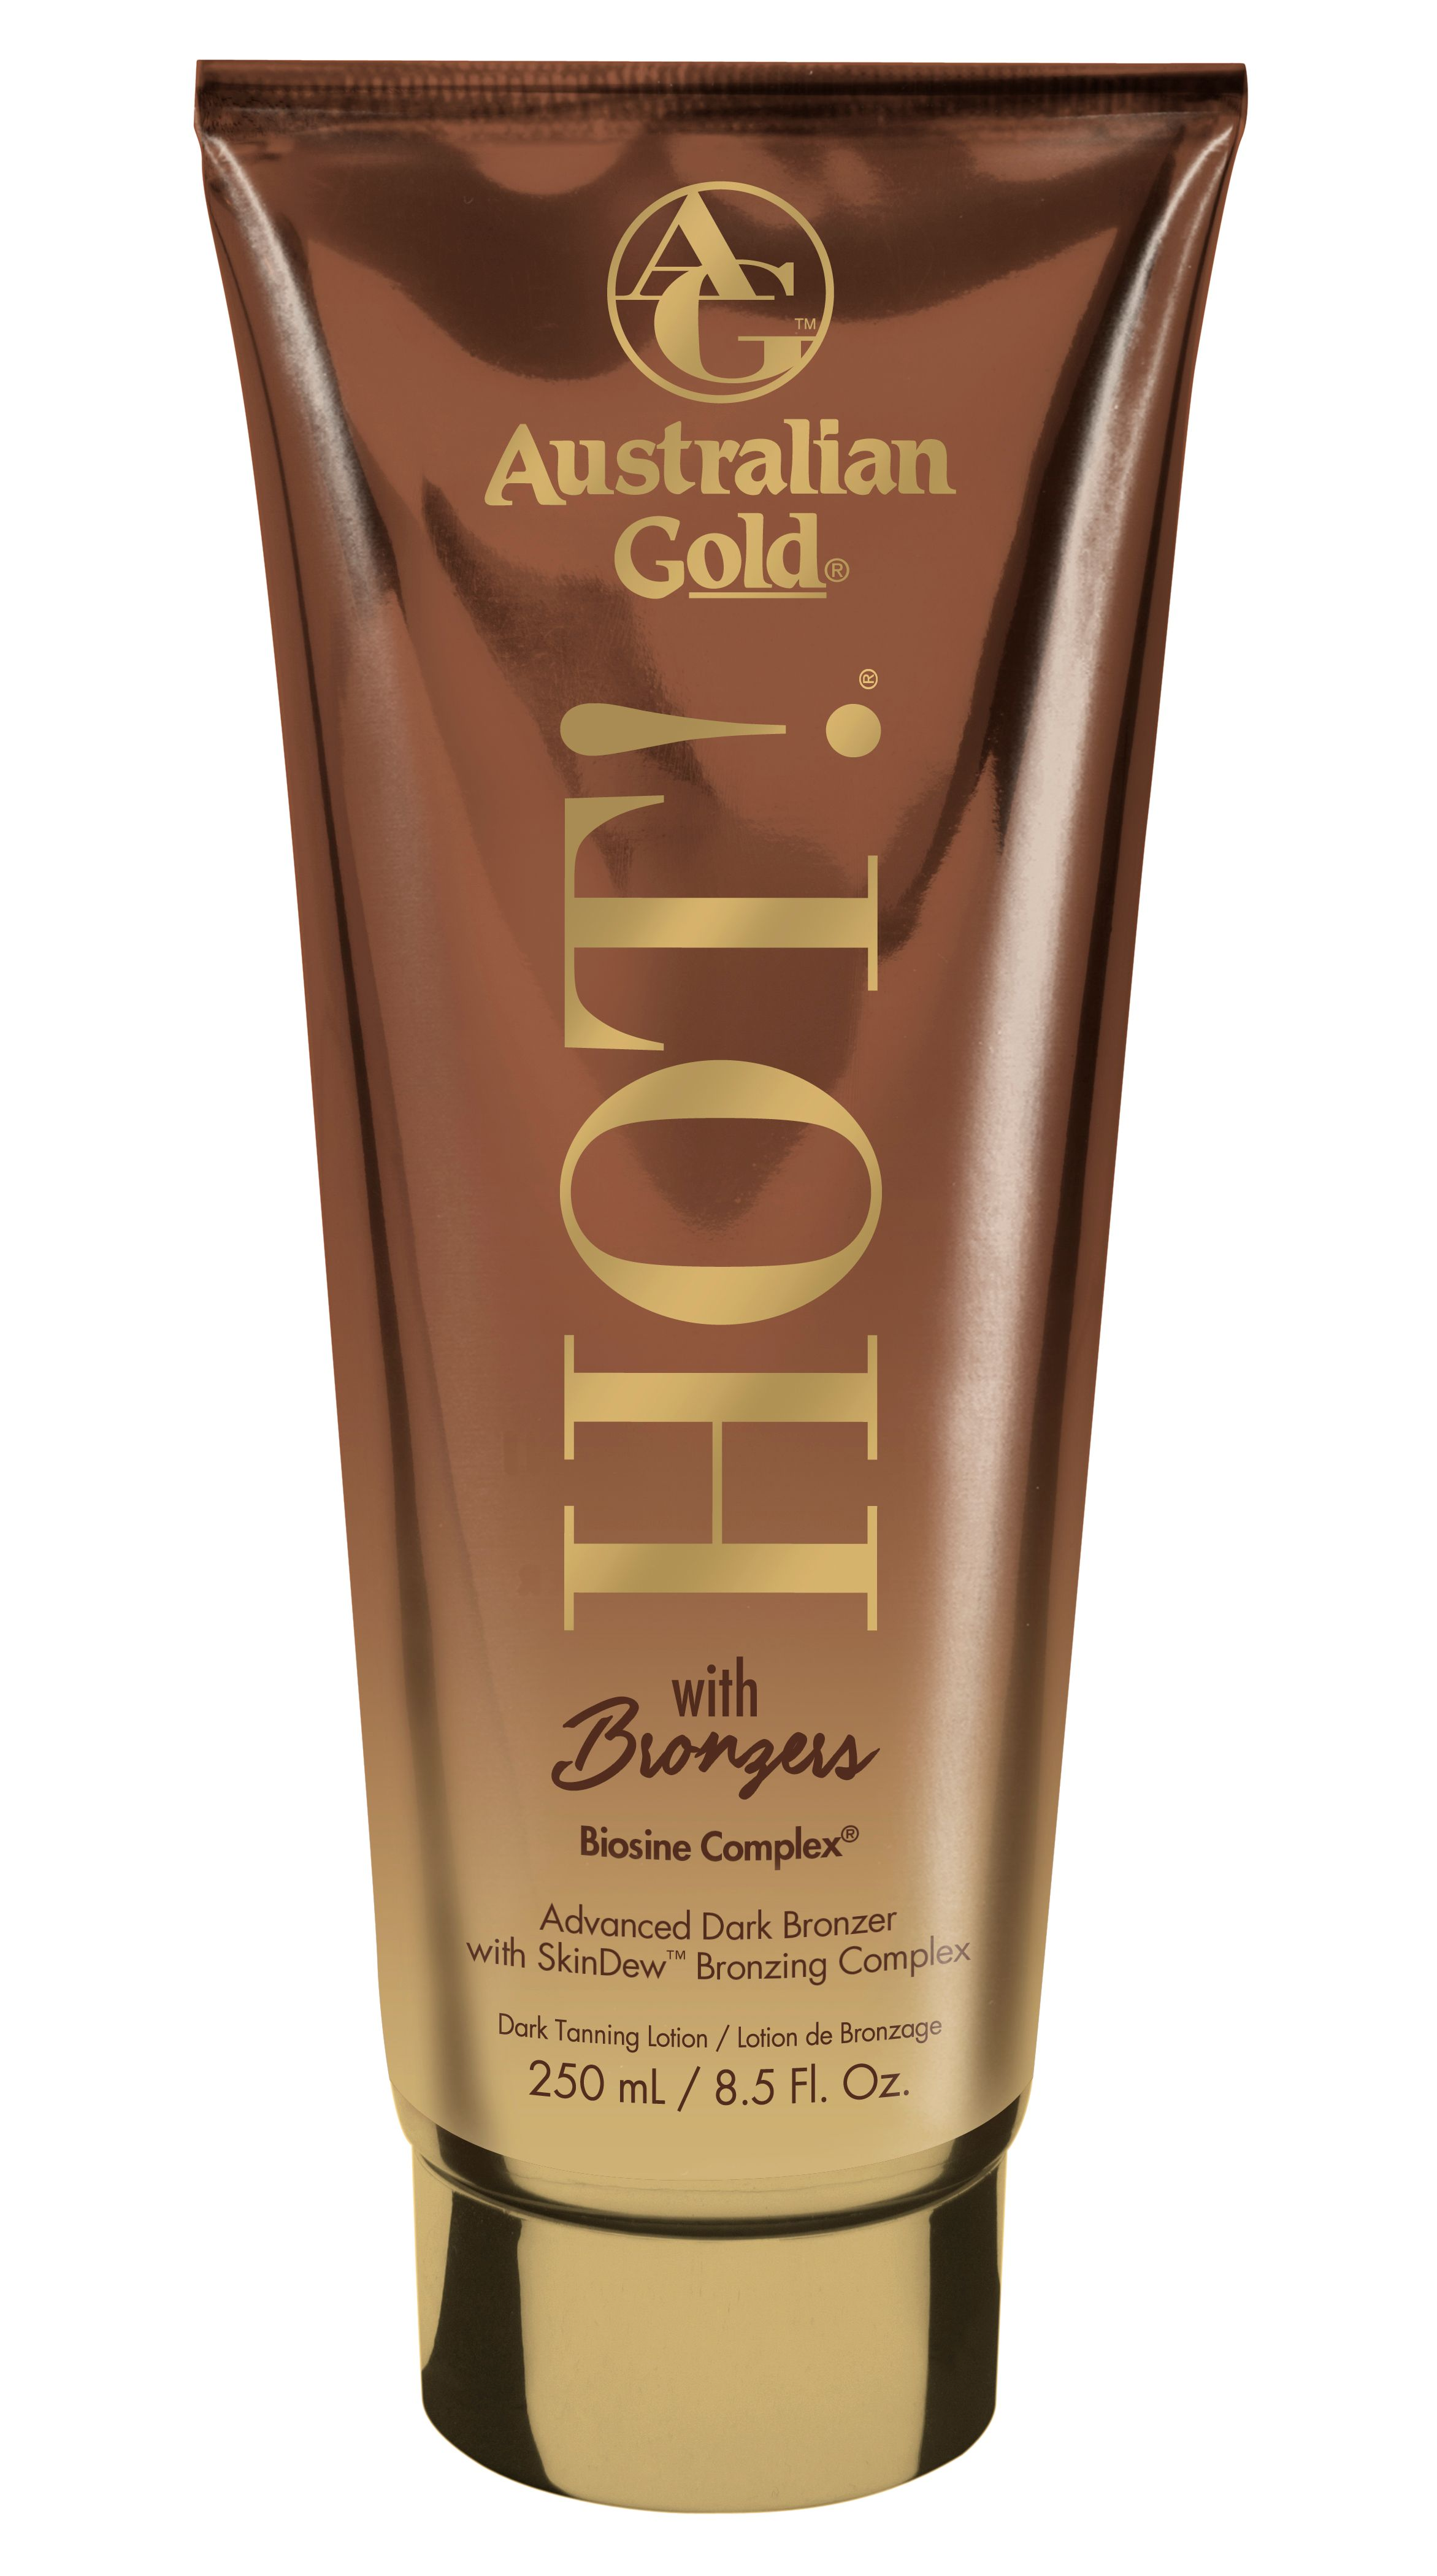 Australian Gold - Hot! With Bronzers 250 ml